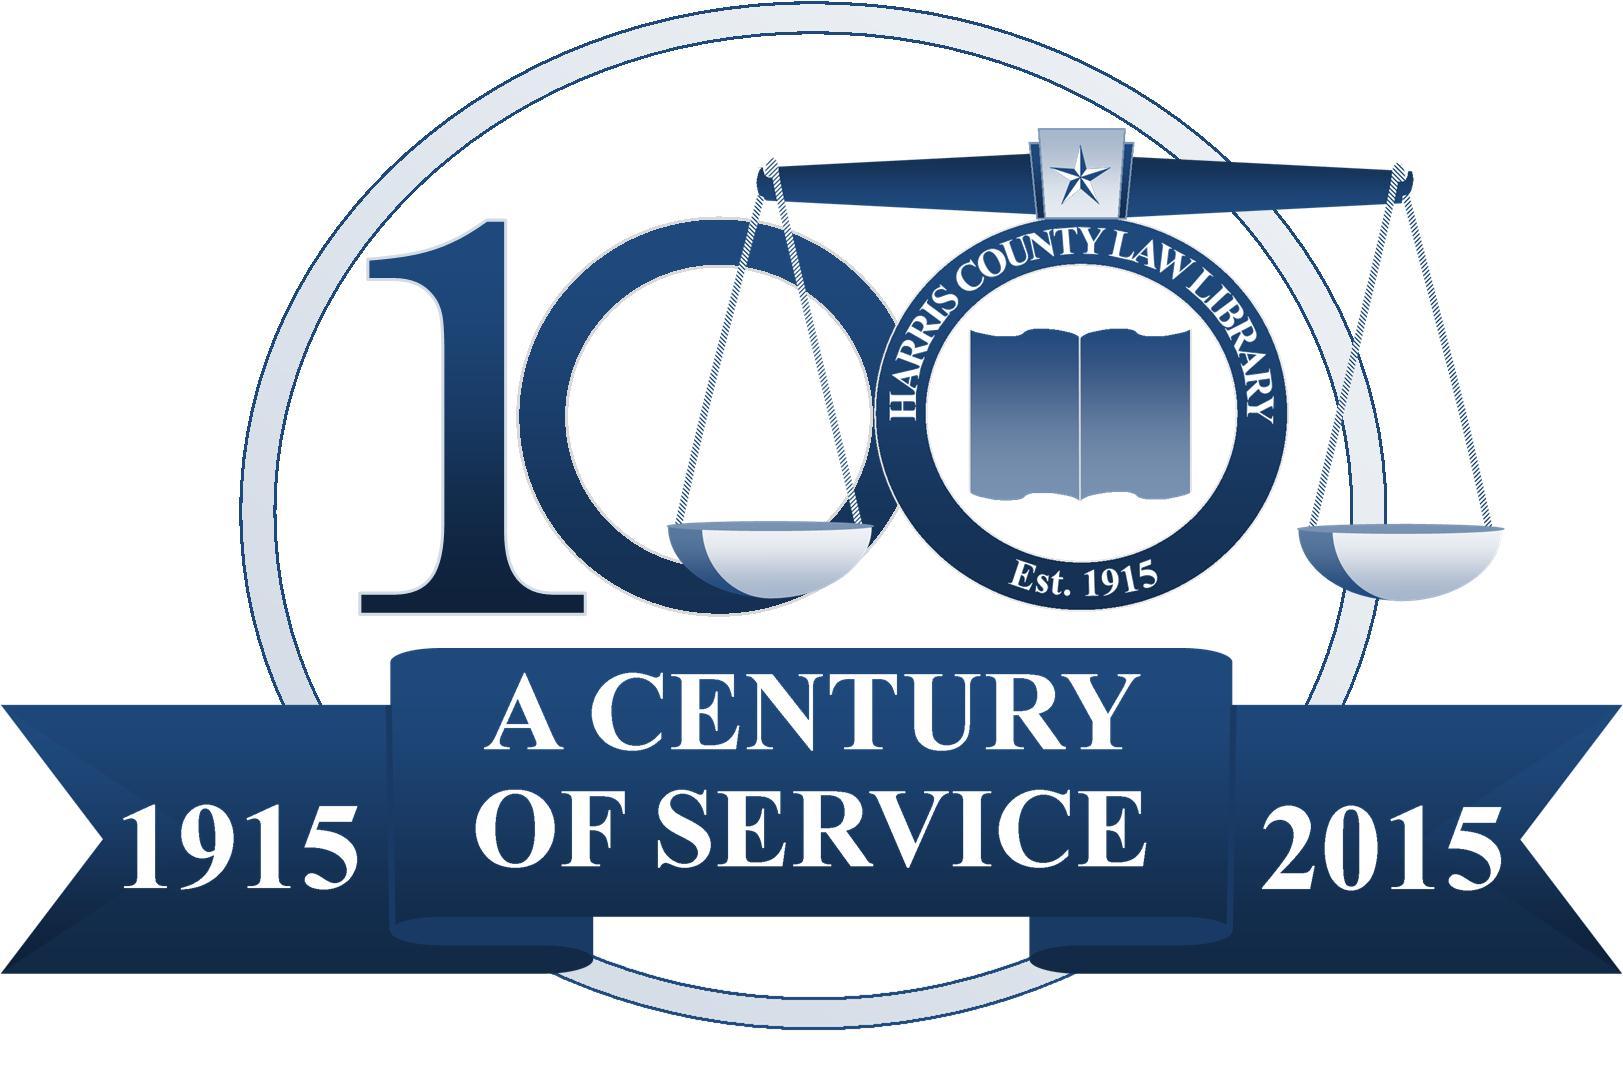 Harris County Law Library, Est. 1915 - A Century of Service: 1915-2015 (Centennial Logo)